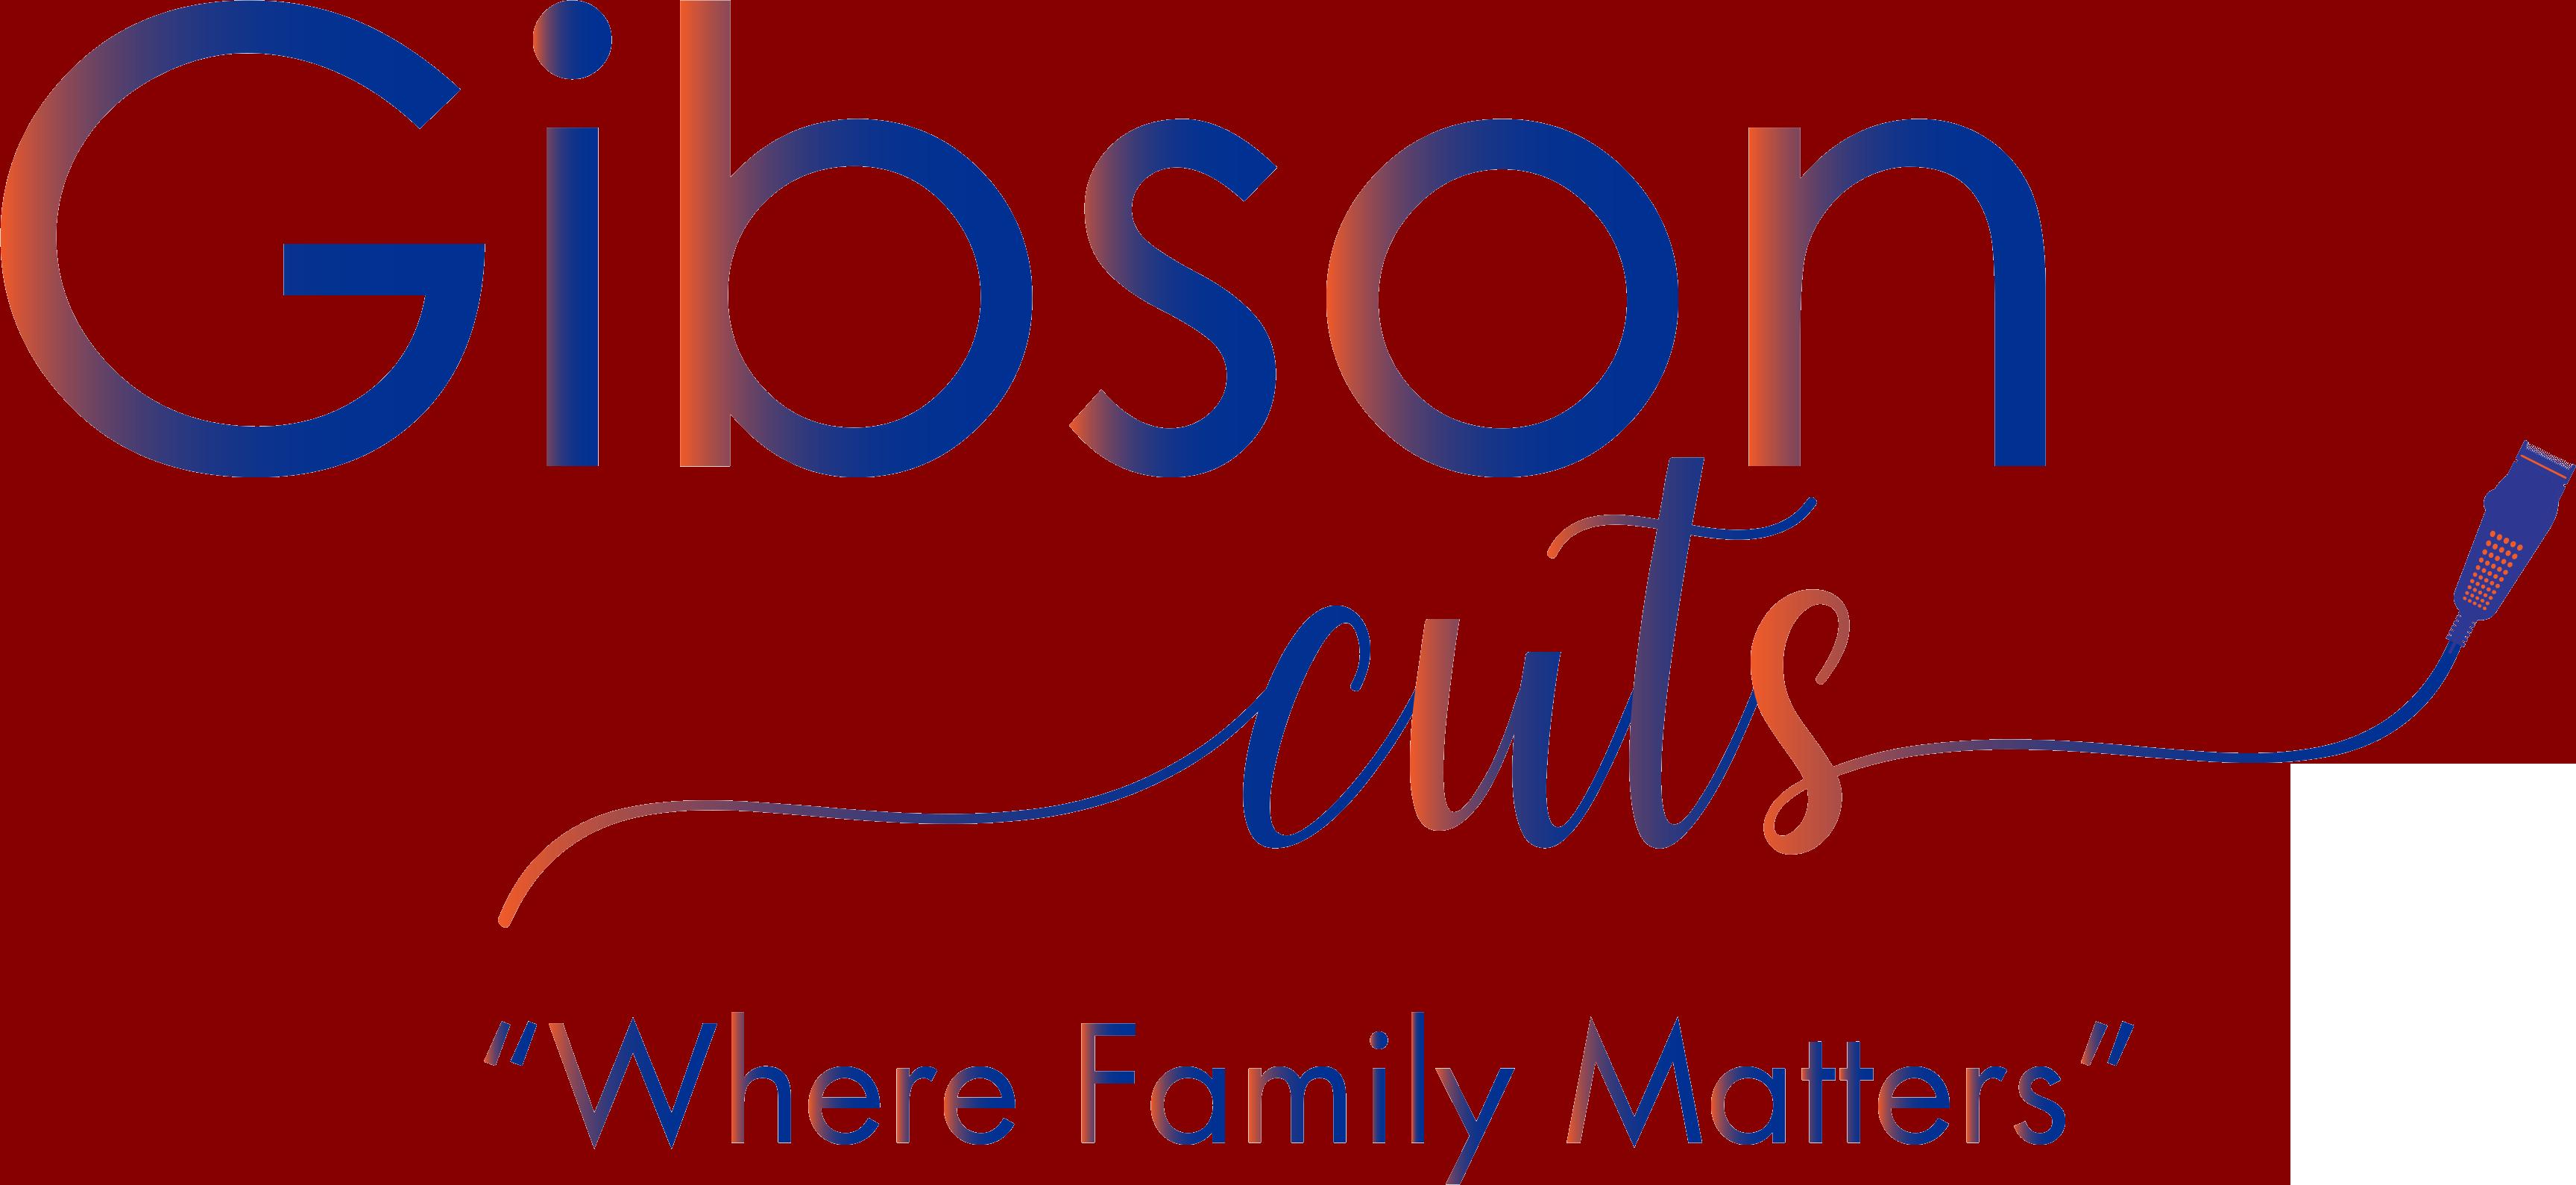 Gibson Cuts